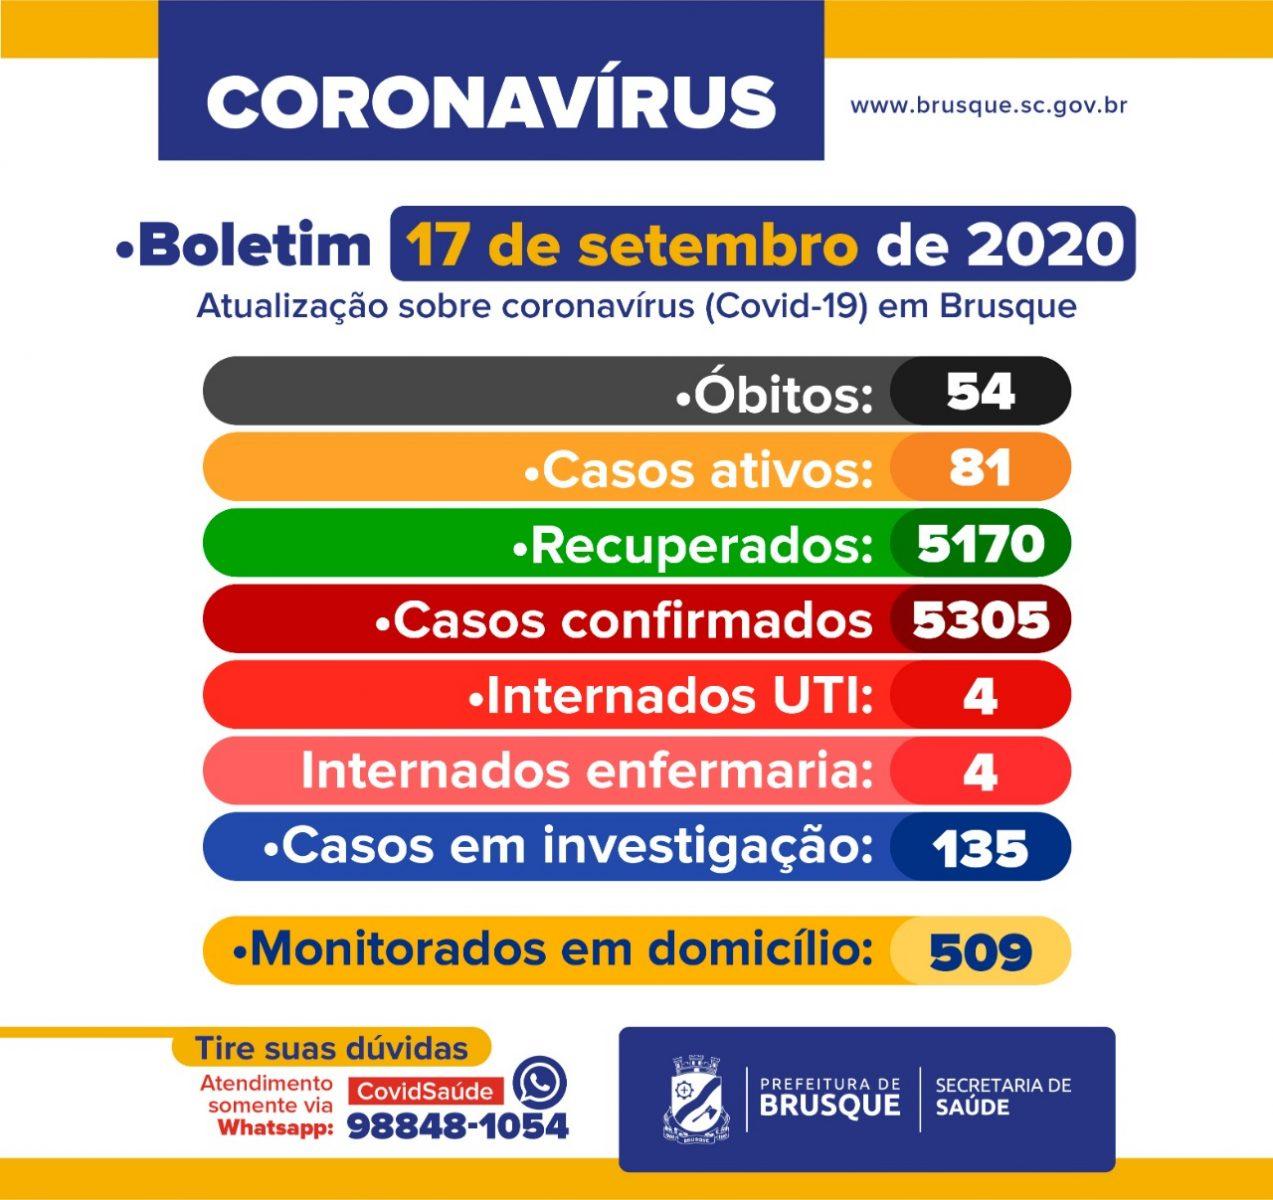 COVID-19: Boletim epidemiológico desta quinta-feira, 17 de setembro